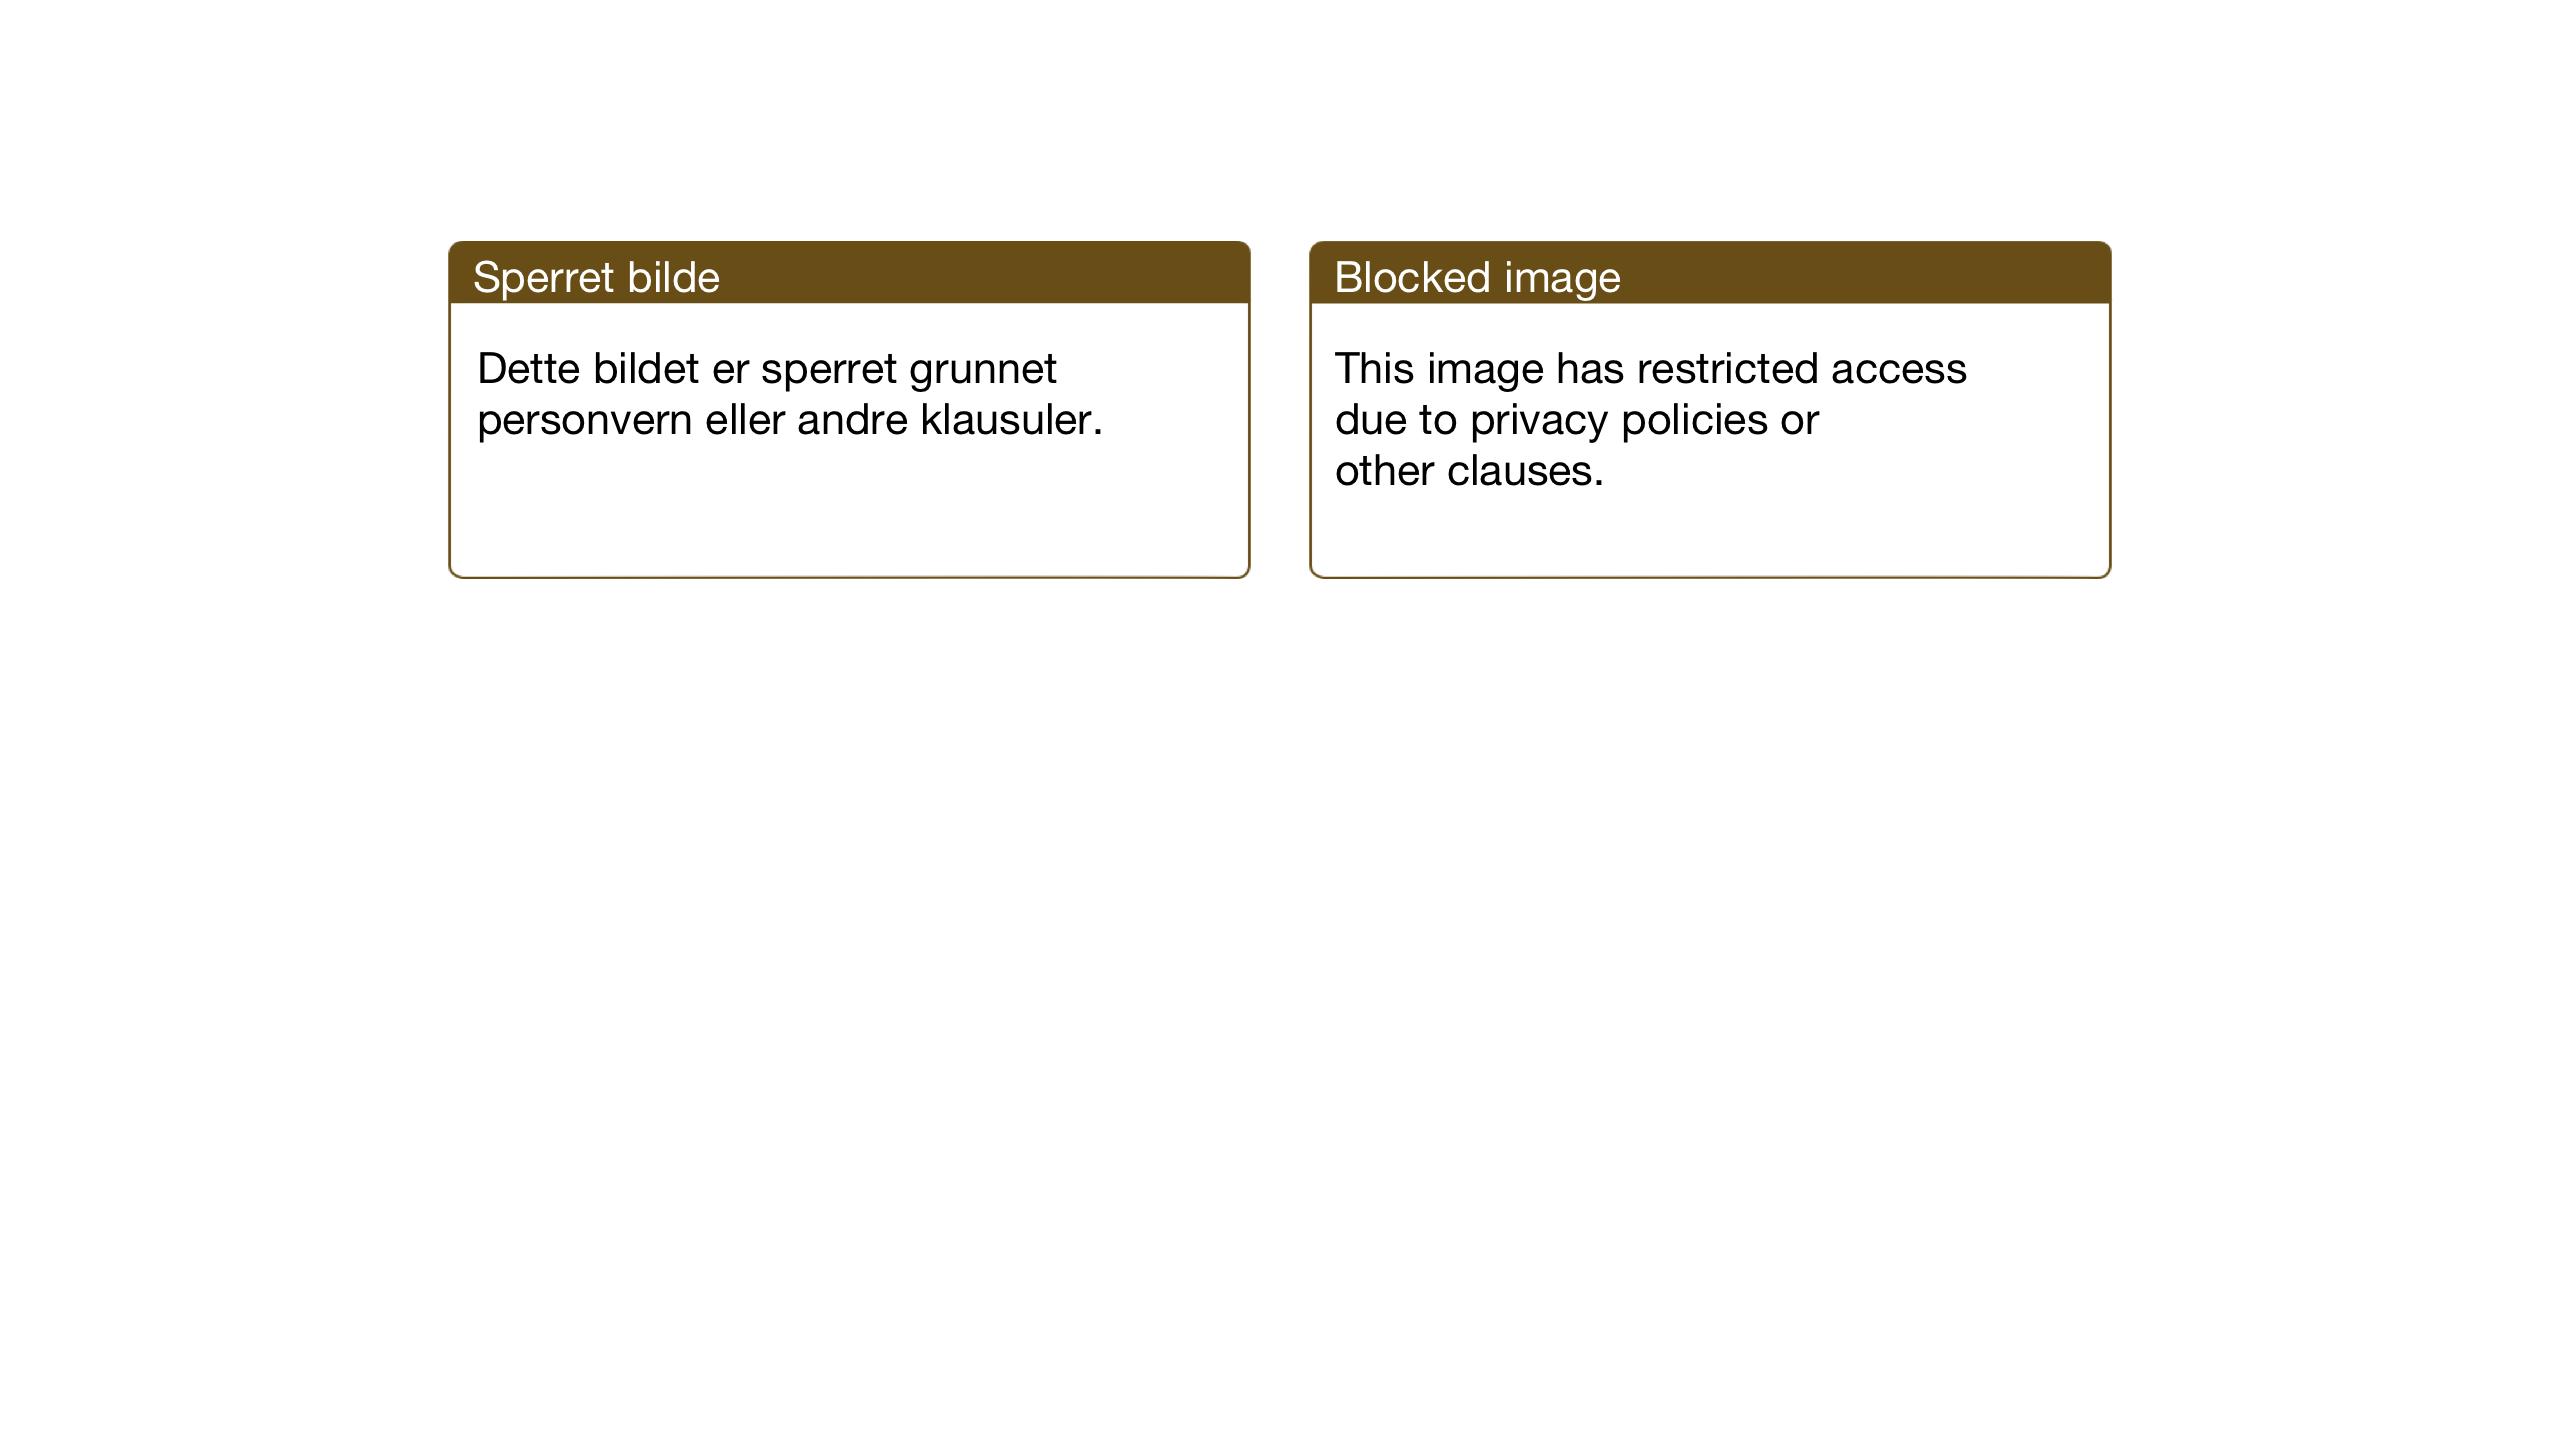 SAT, Ministerialprotokoller, klokkerbøker og fødselsregistre - Nordland, 882/L1183: Klokkerbok nr. 882C01, 1911-1938, s. 117